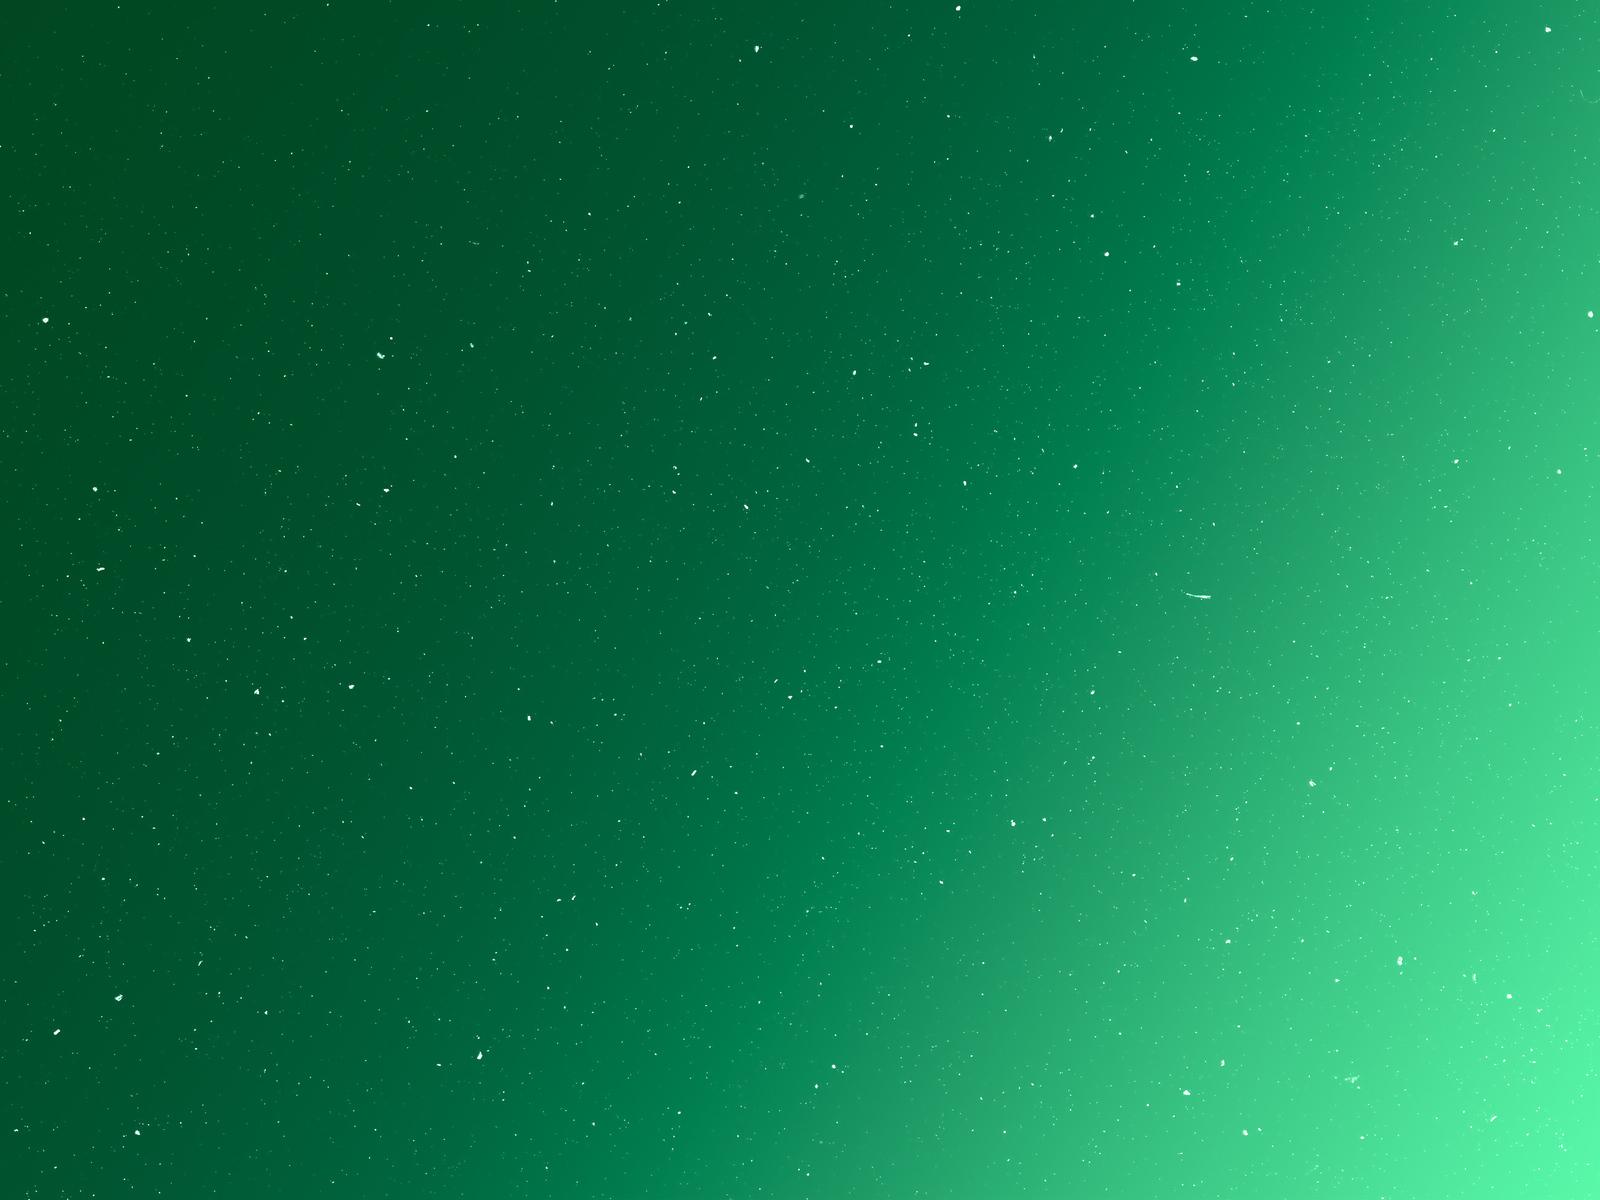 green-space-stars-abstract-4k-u7.jpg